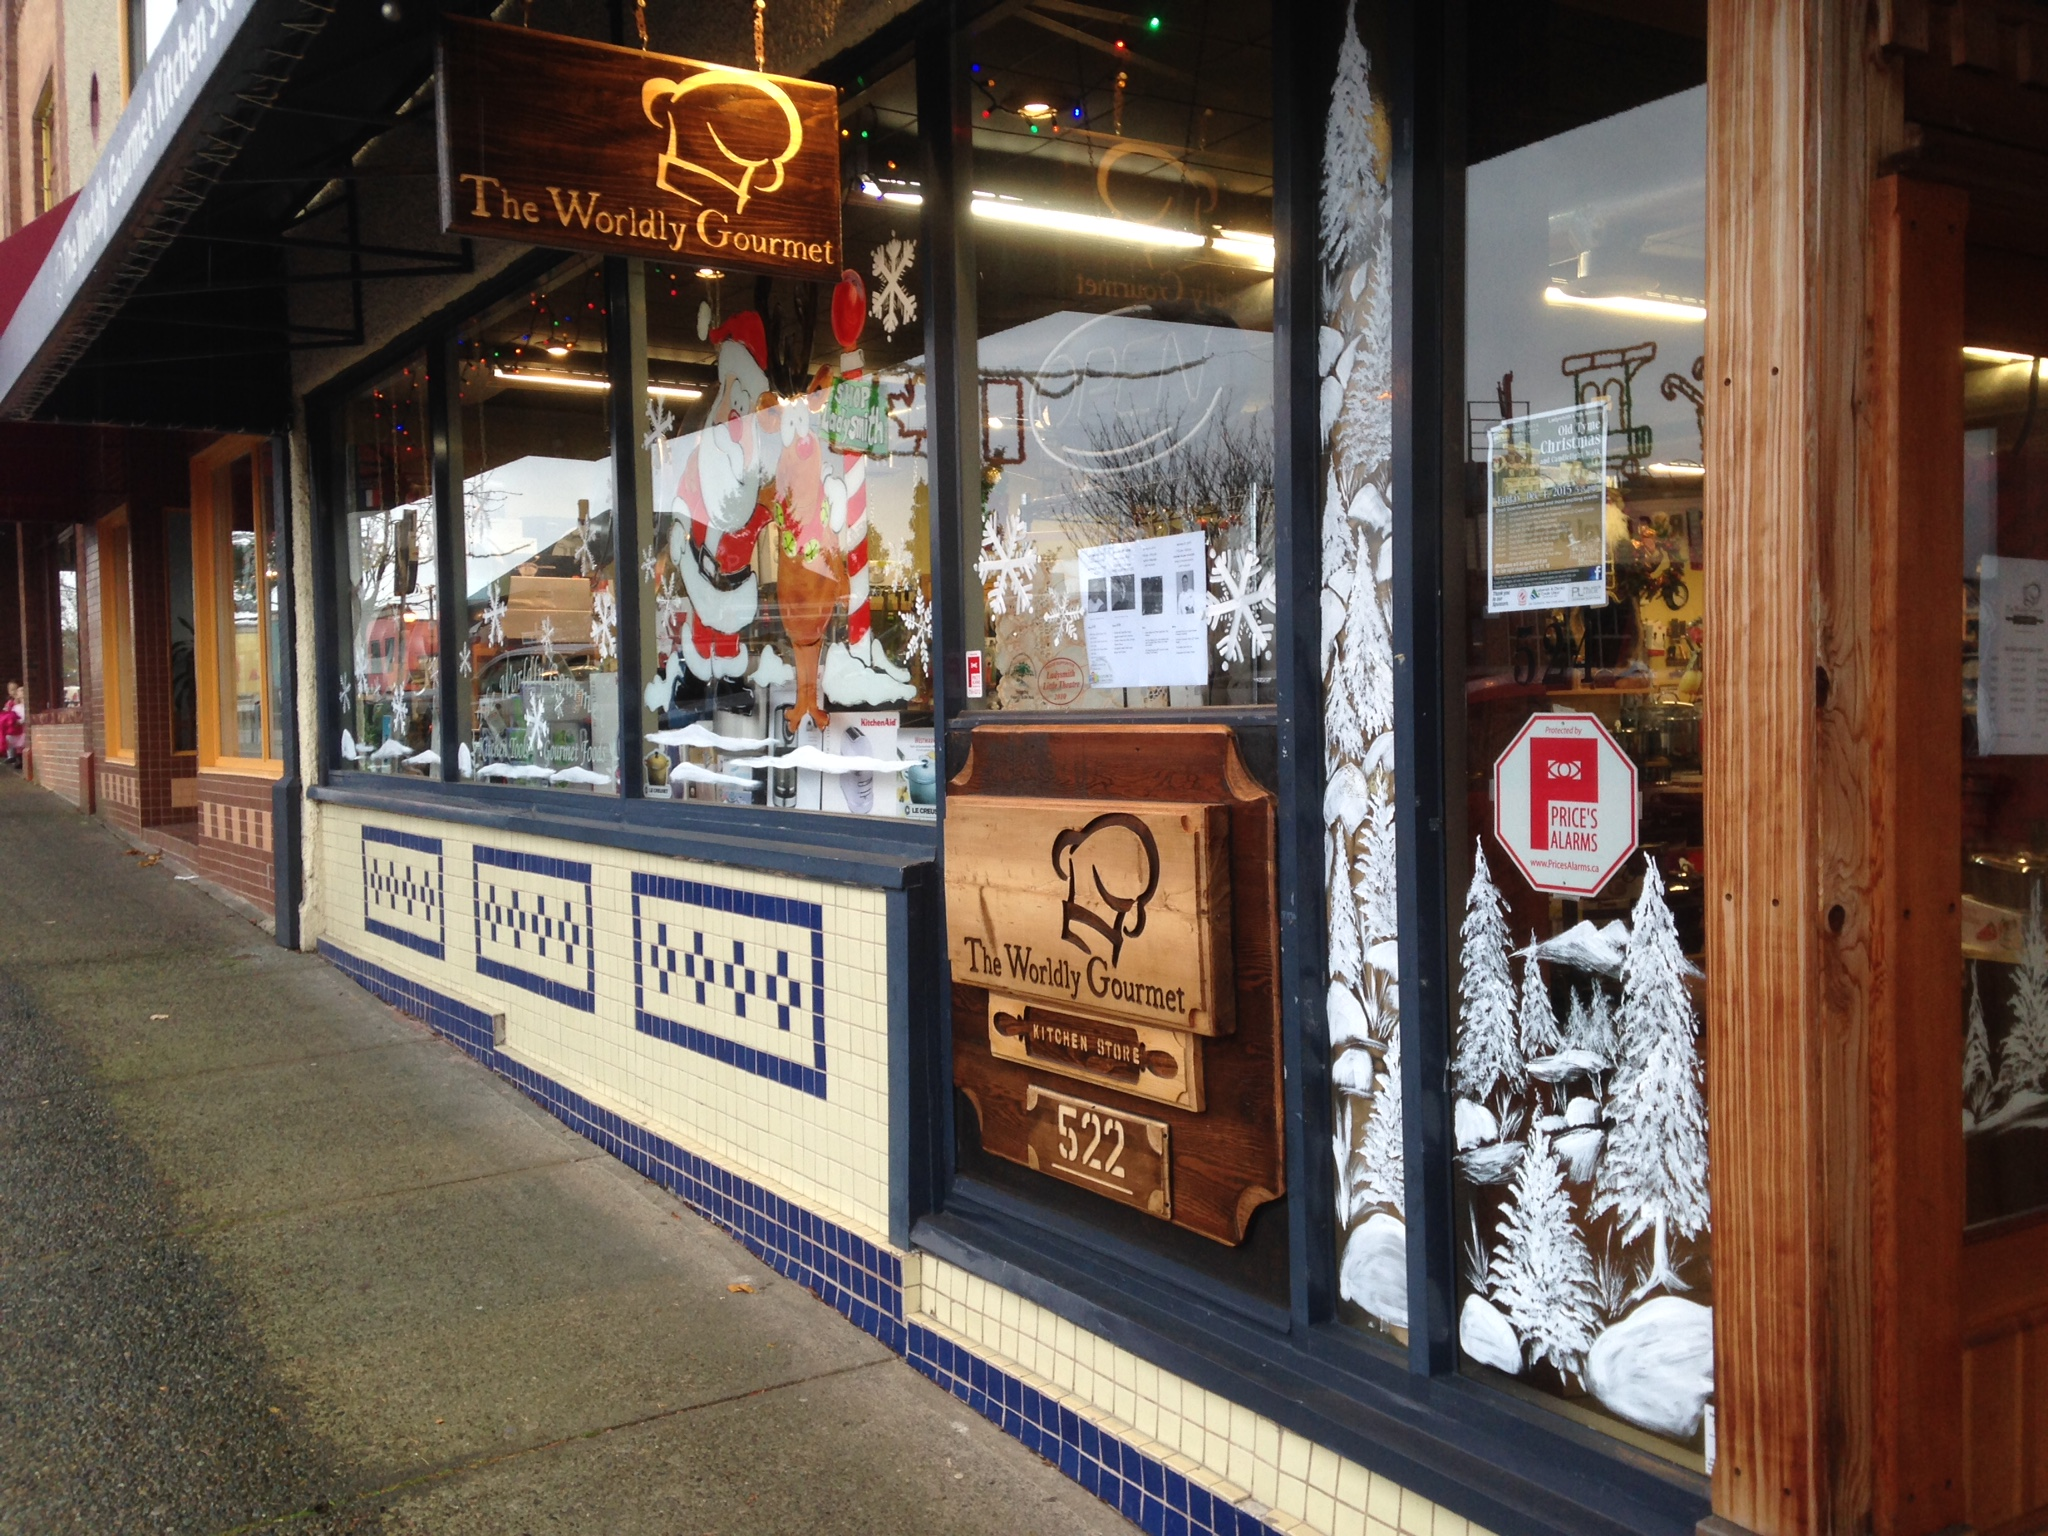 the worldly gourmet kitchen store 522 1st ave ladysmith ladysmith